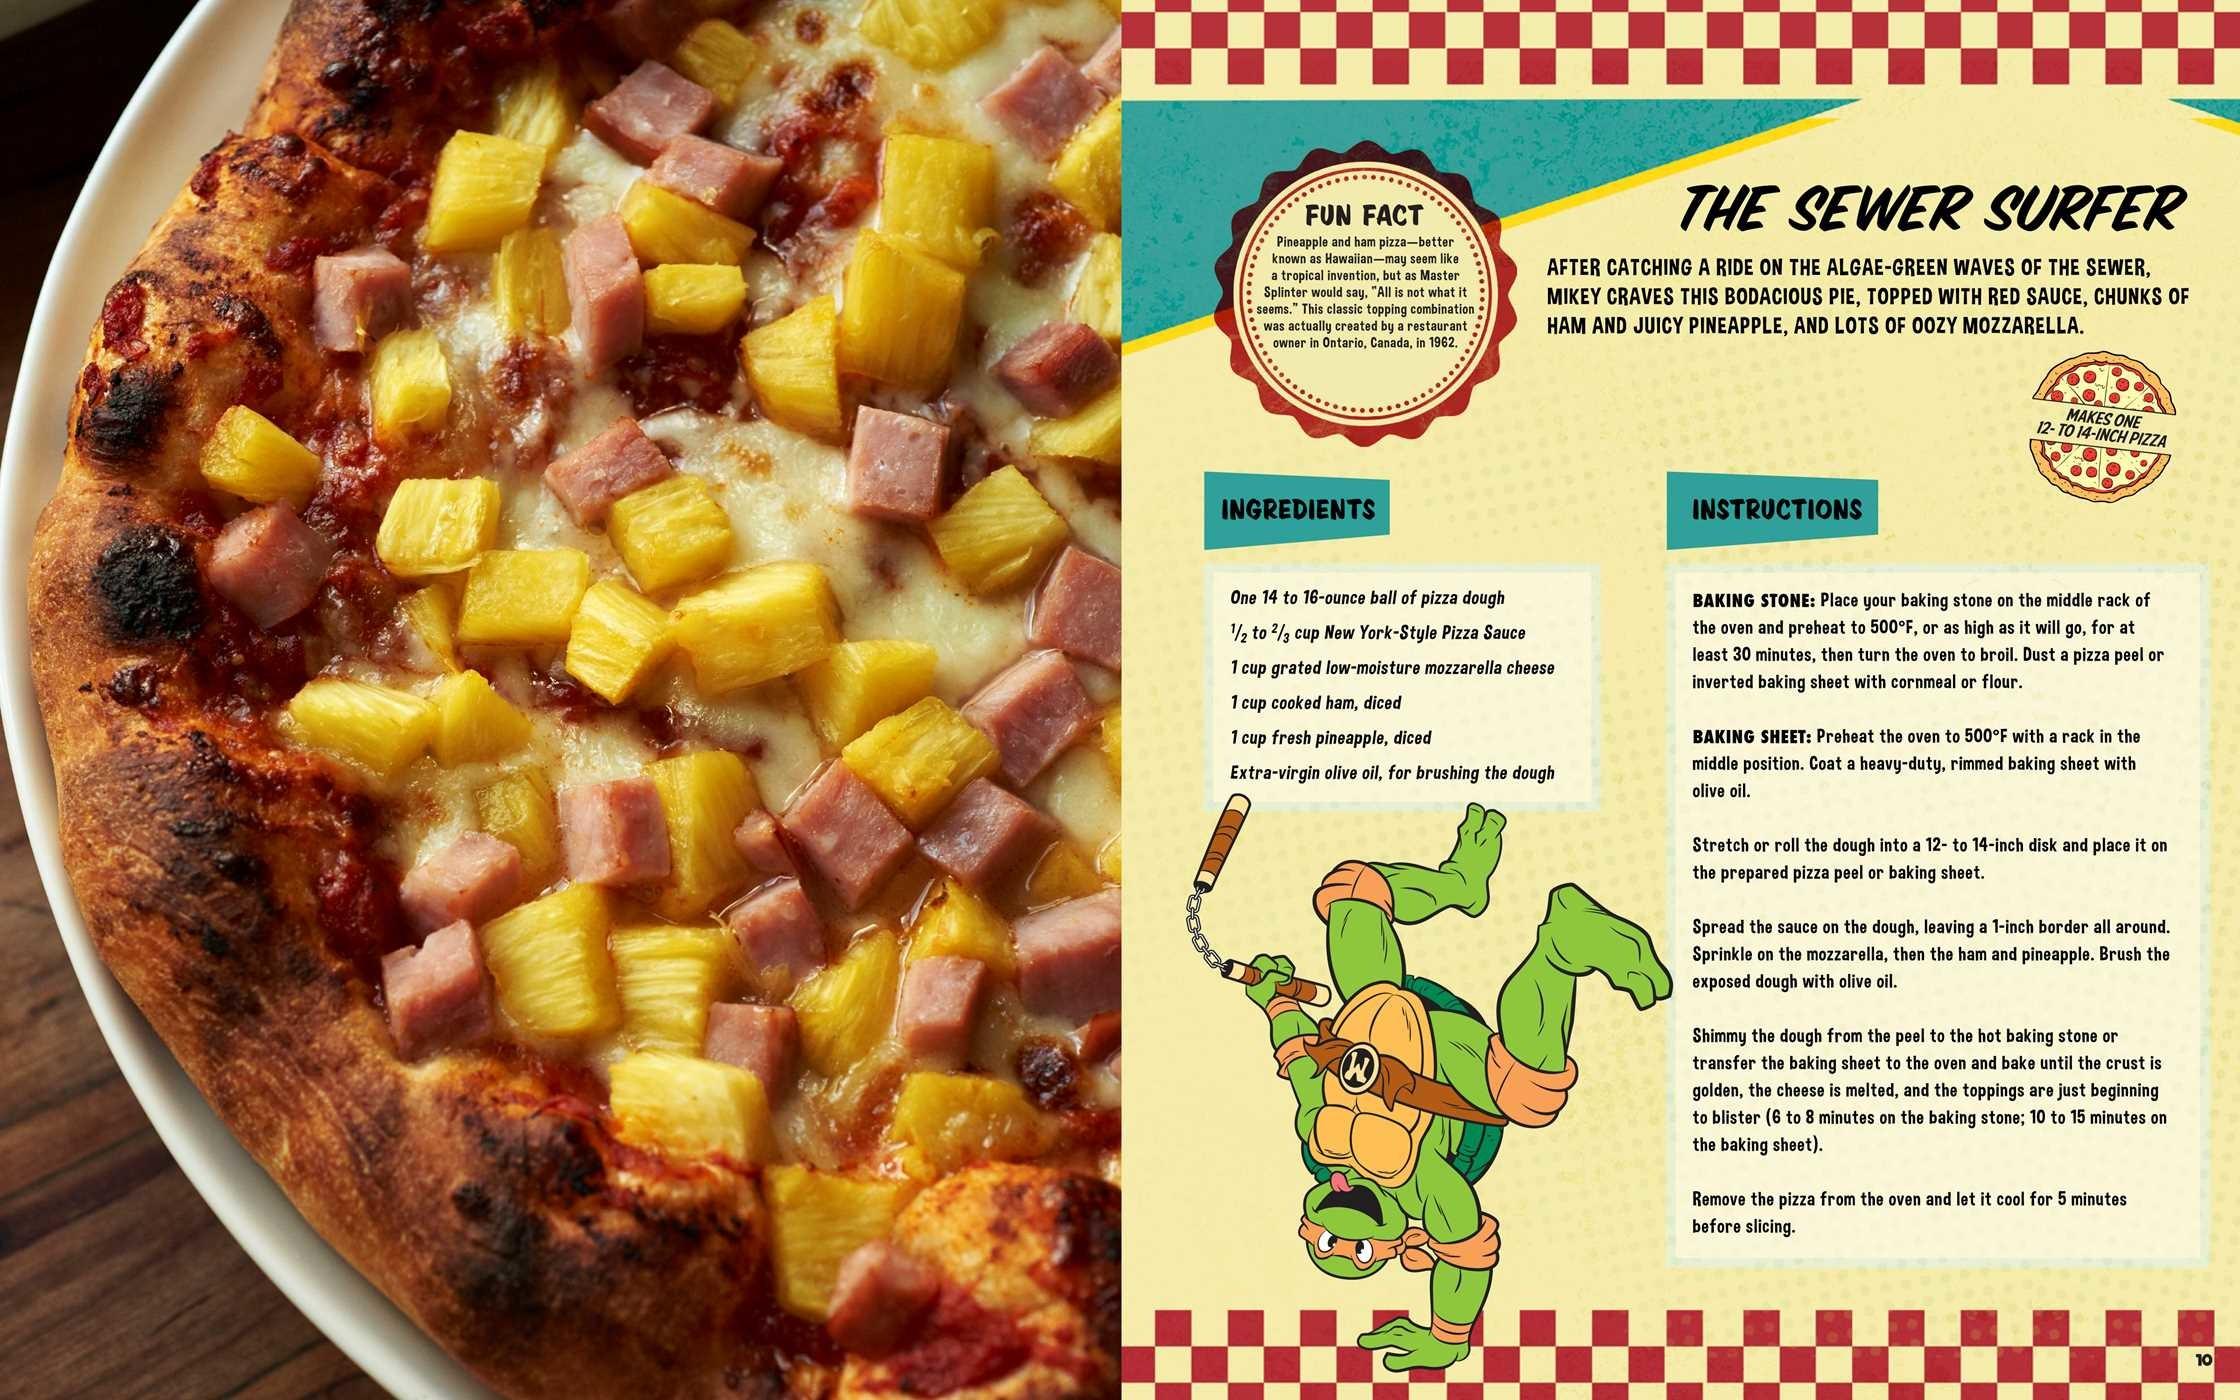 Teenage mutant ninja turtles the official pizza cookbook 9781608878314.in03